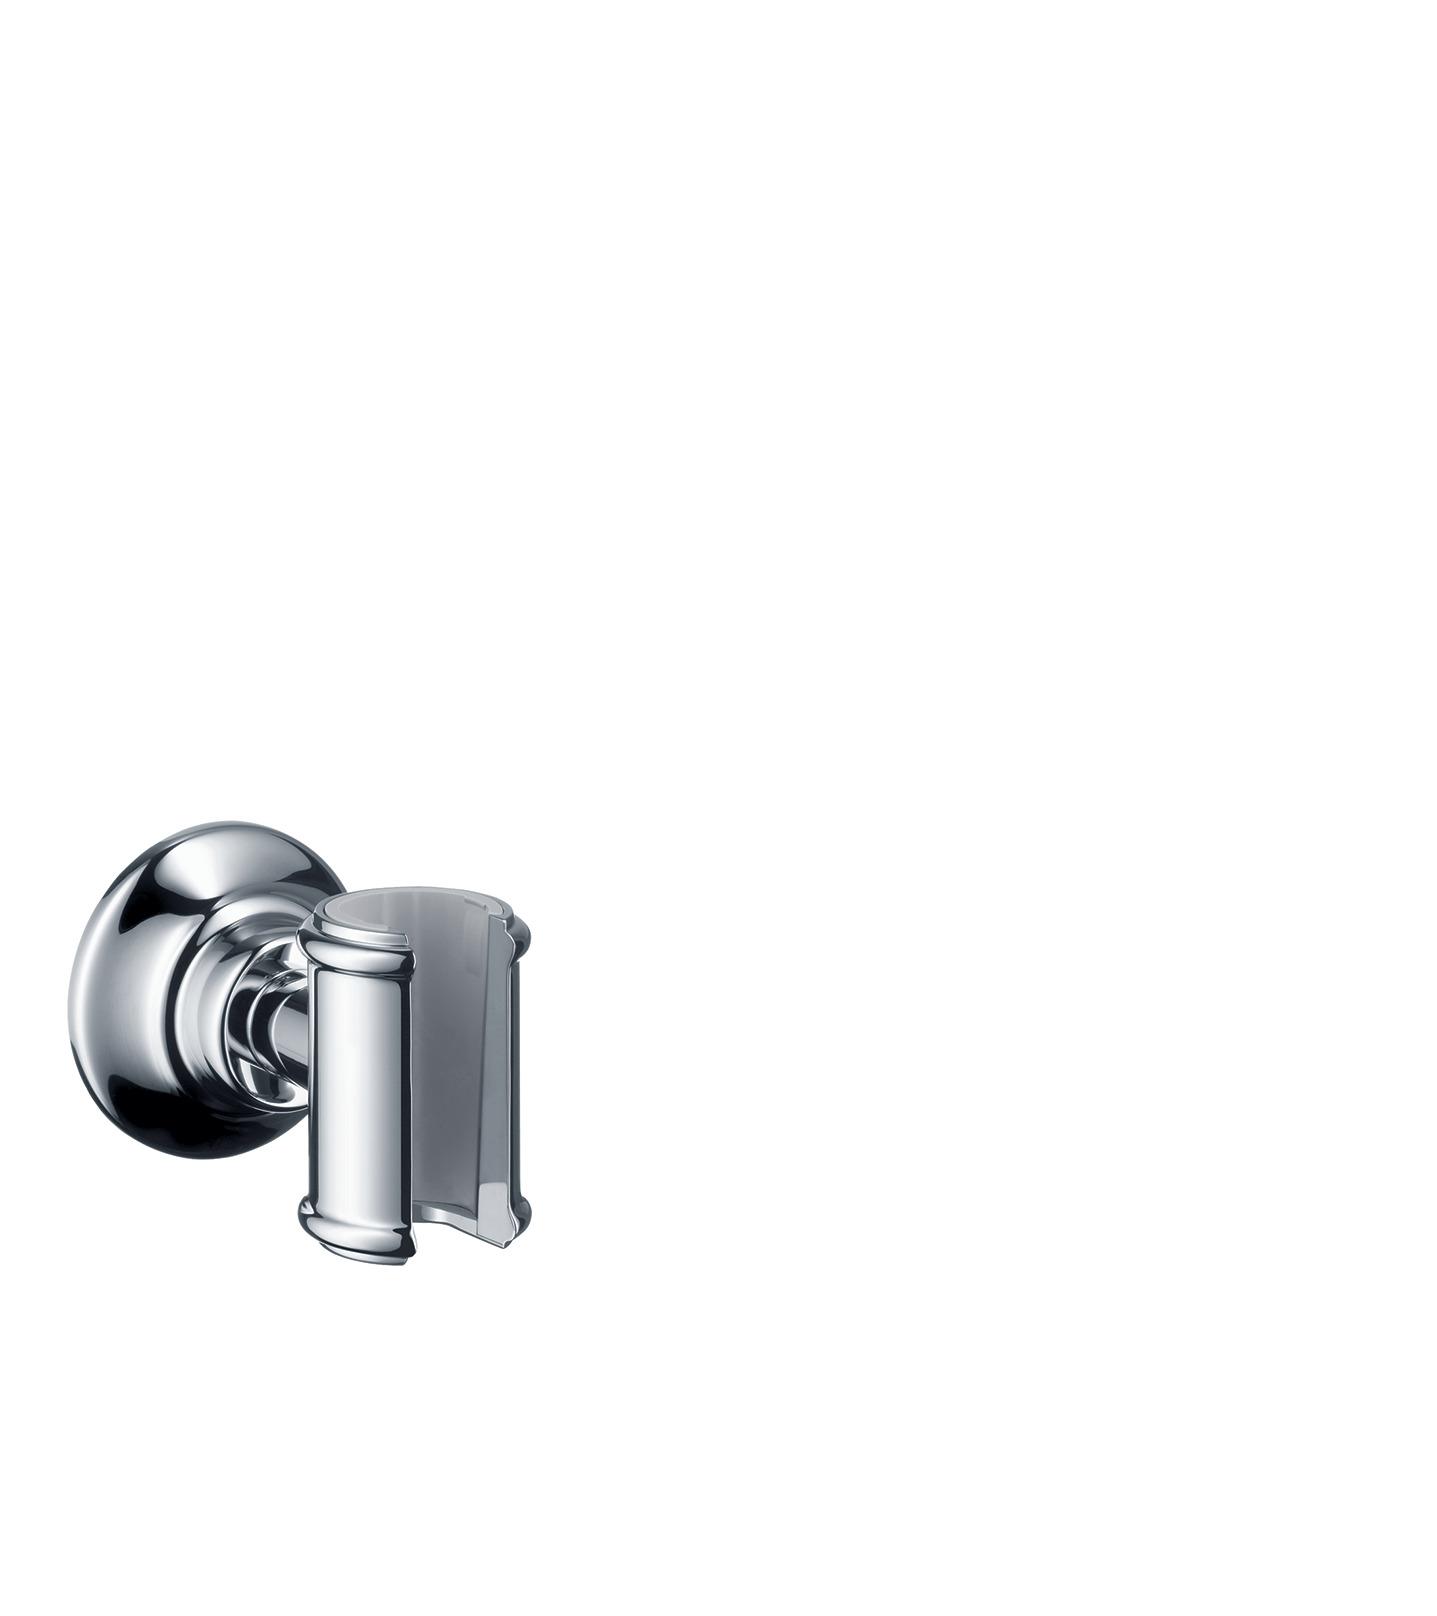 Axor Int Axor Montreux Shower Holder 16325000